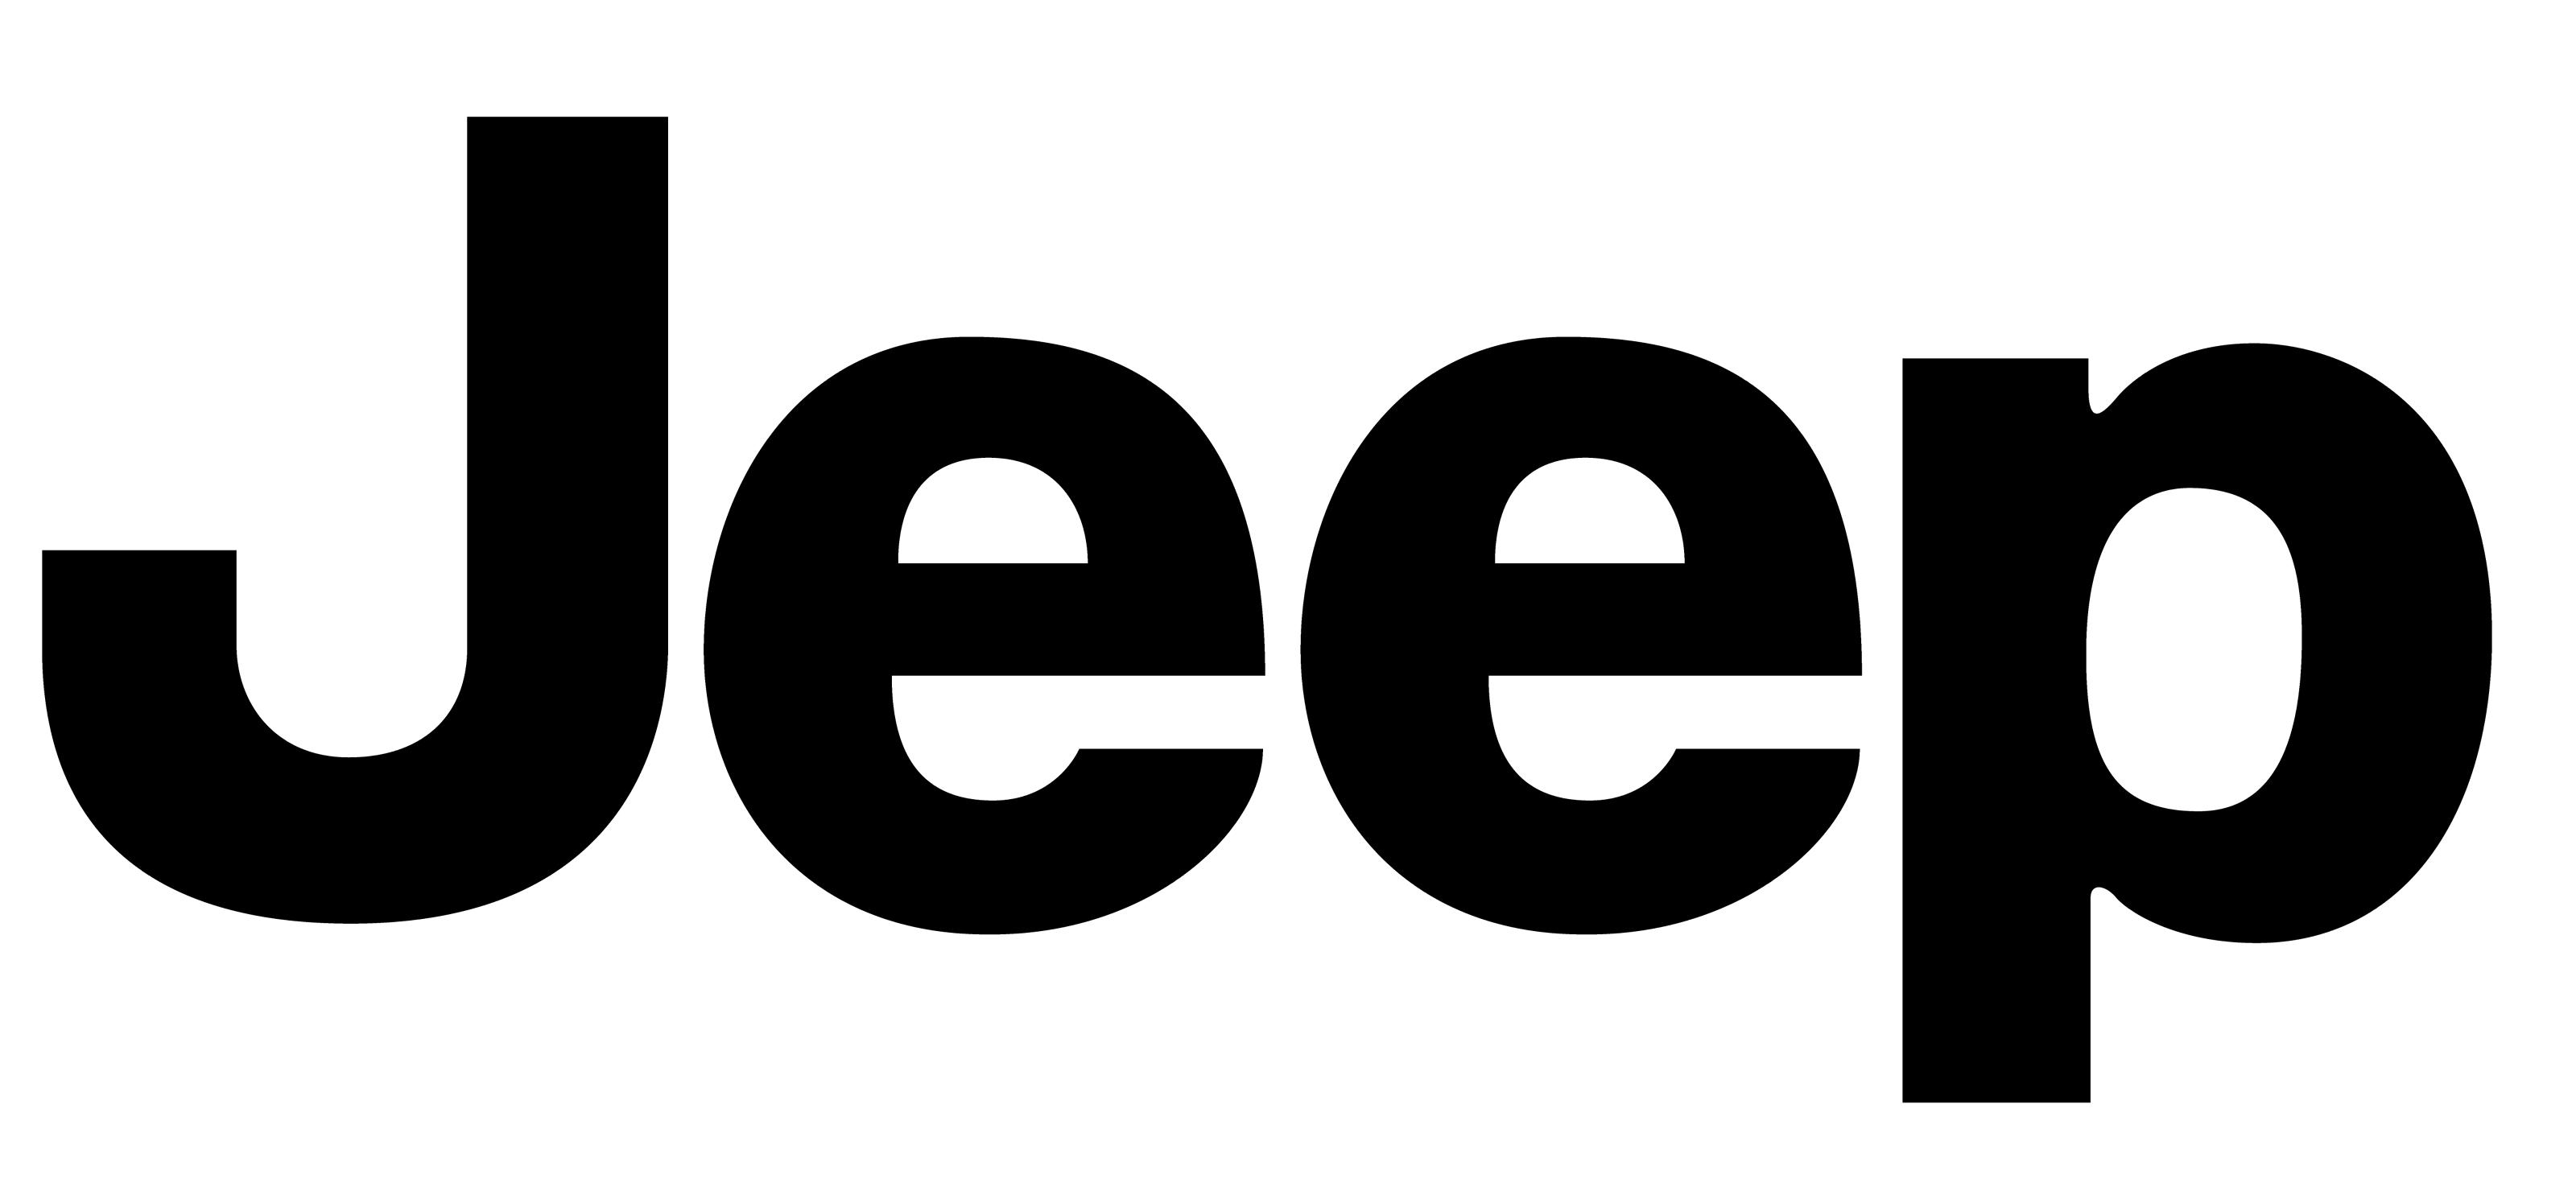 Jeep Car Logo PNG Image.